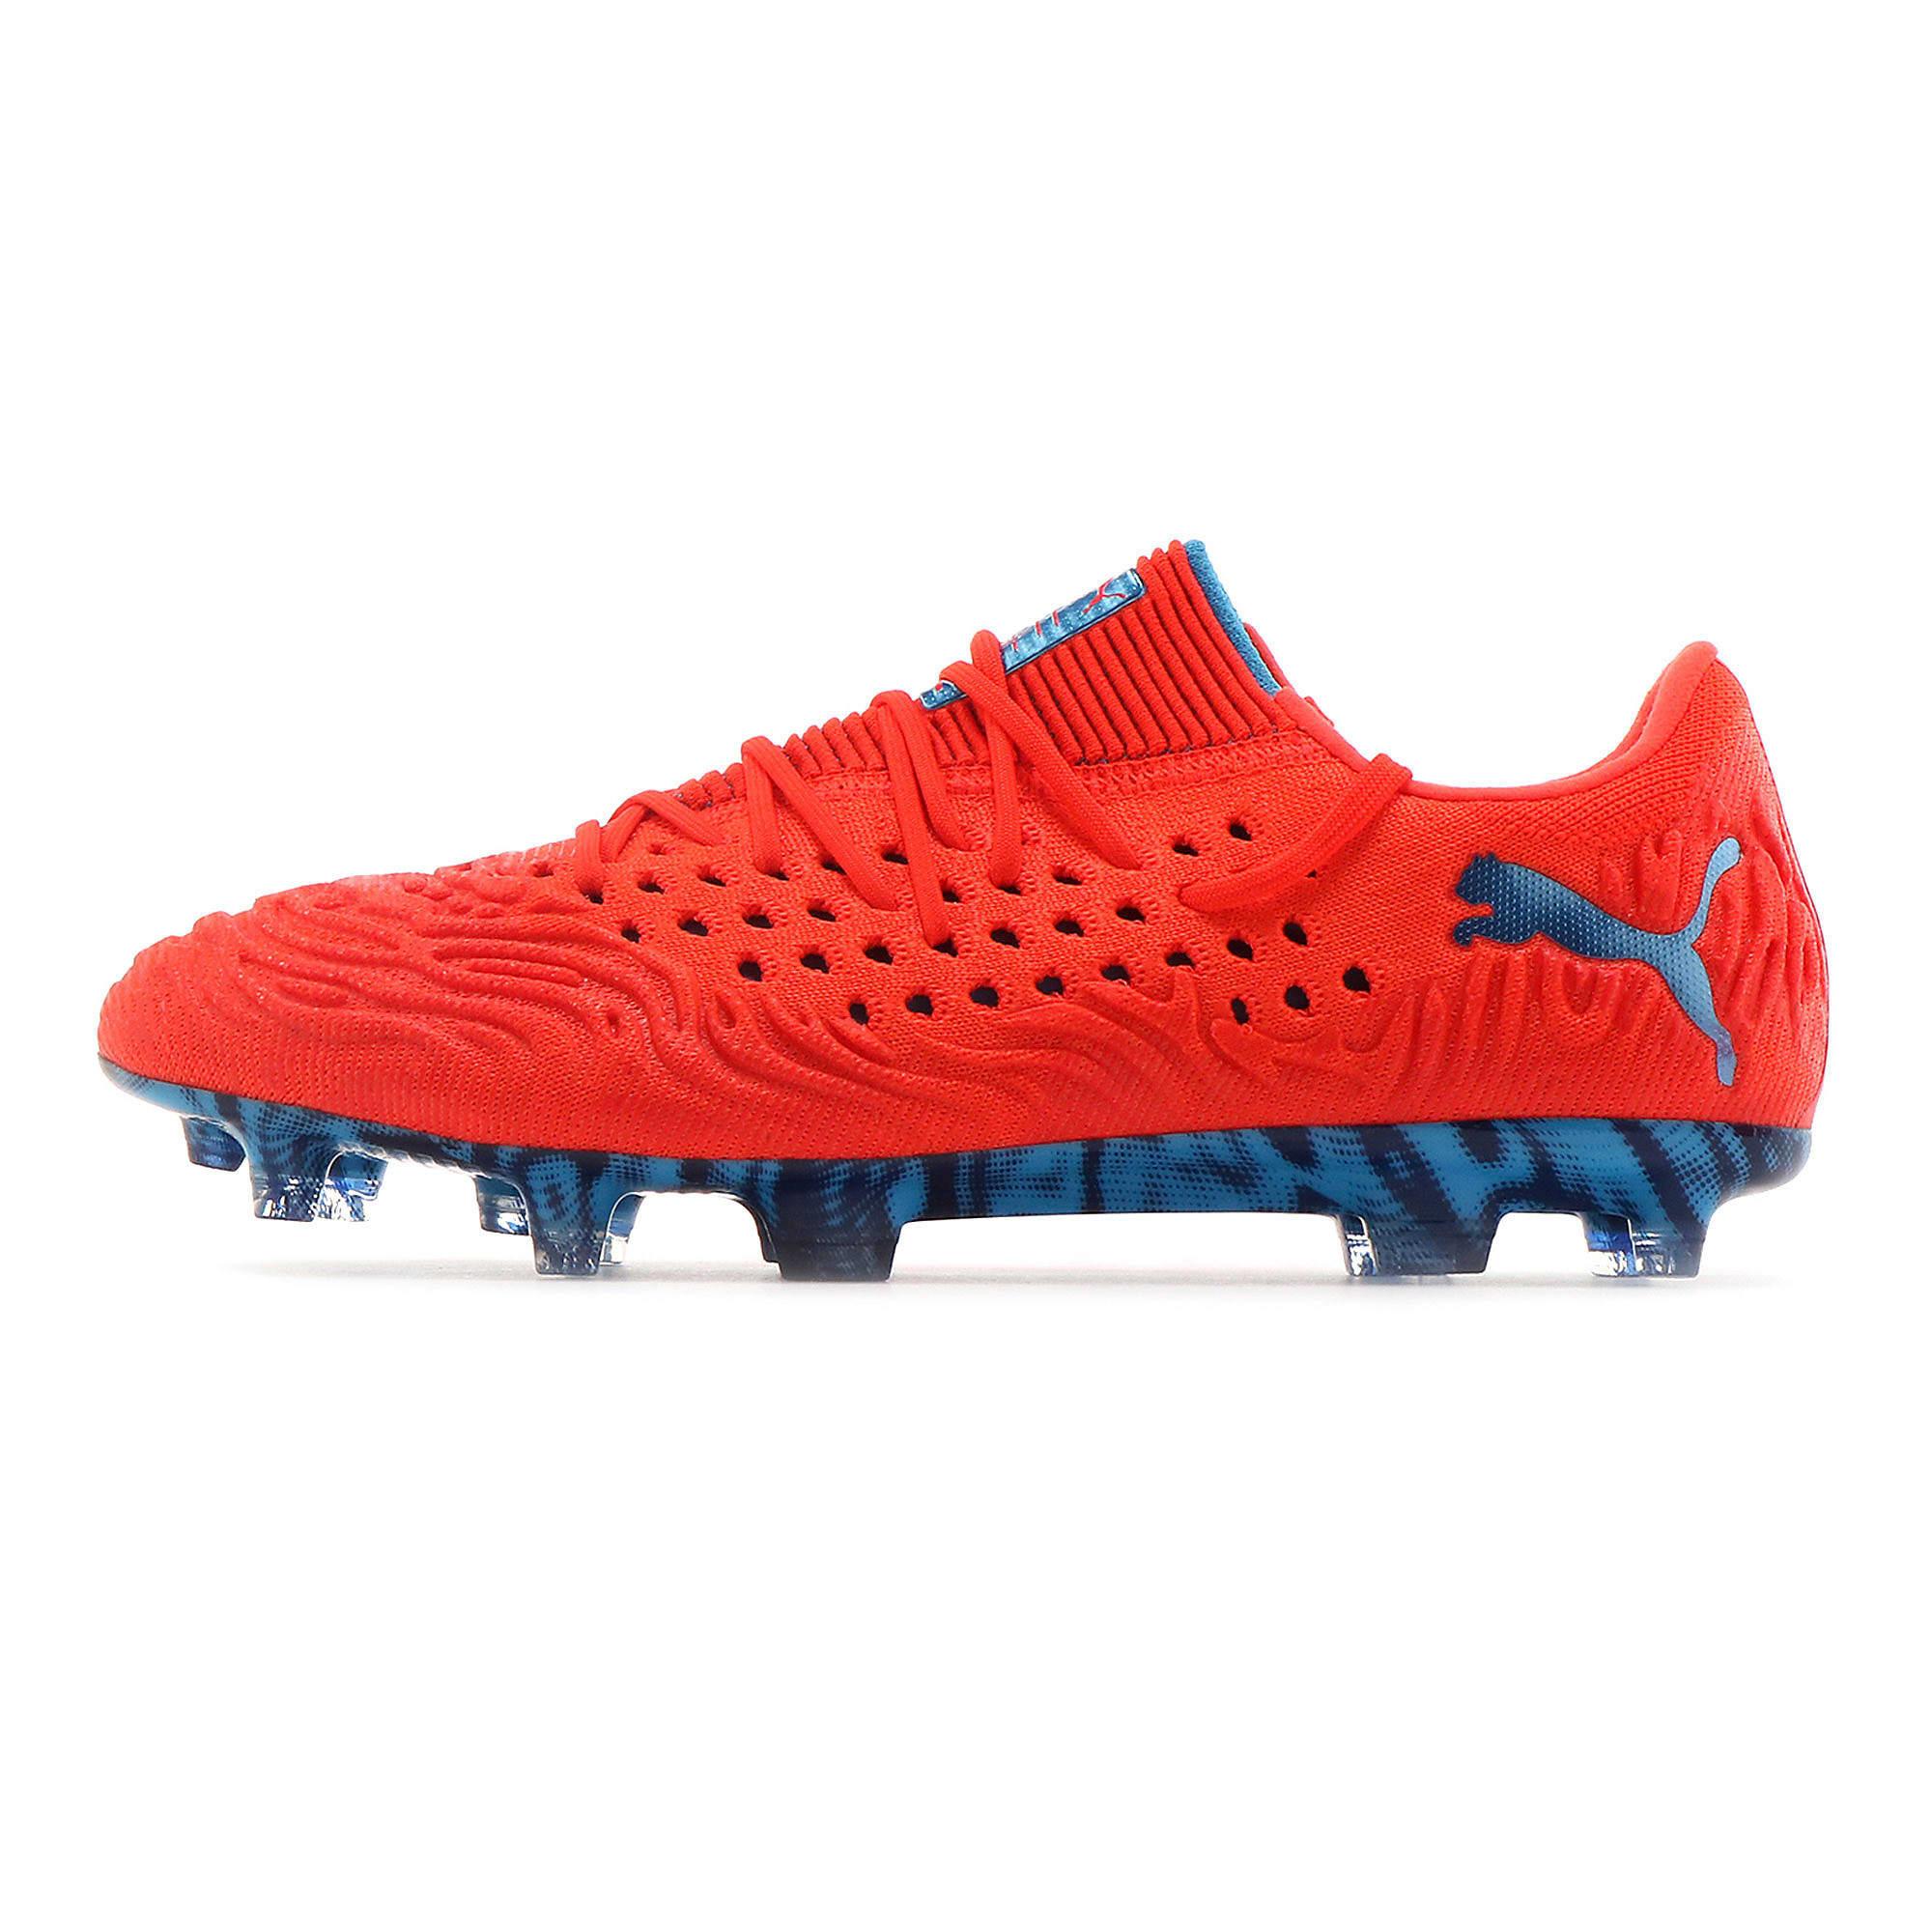 Thumbnail 1 of FUTURE 19.1 NETFIT Lo FG/AG Men's Soccer Cleats, Red Blast-Bleu Azur, medium